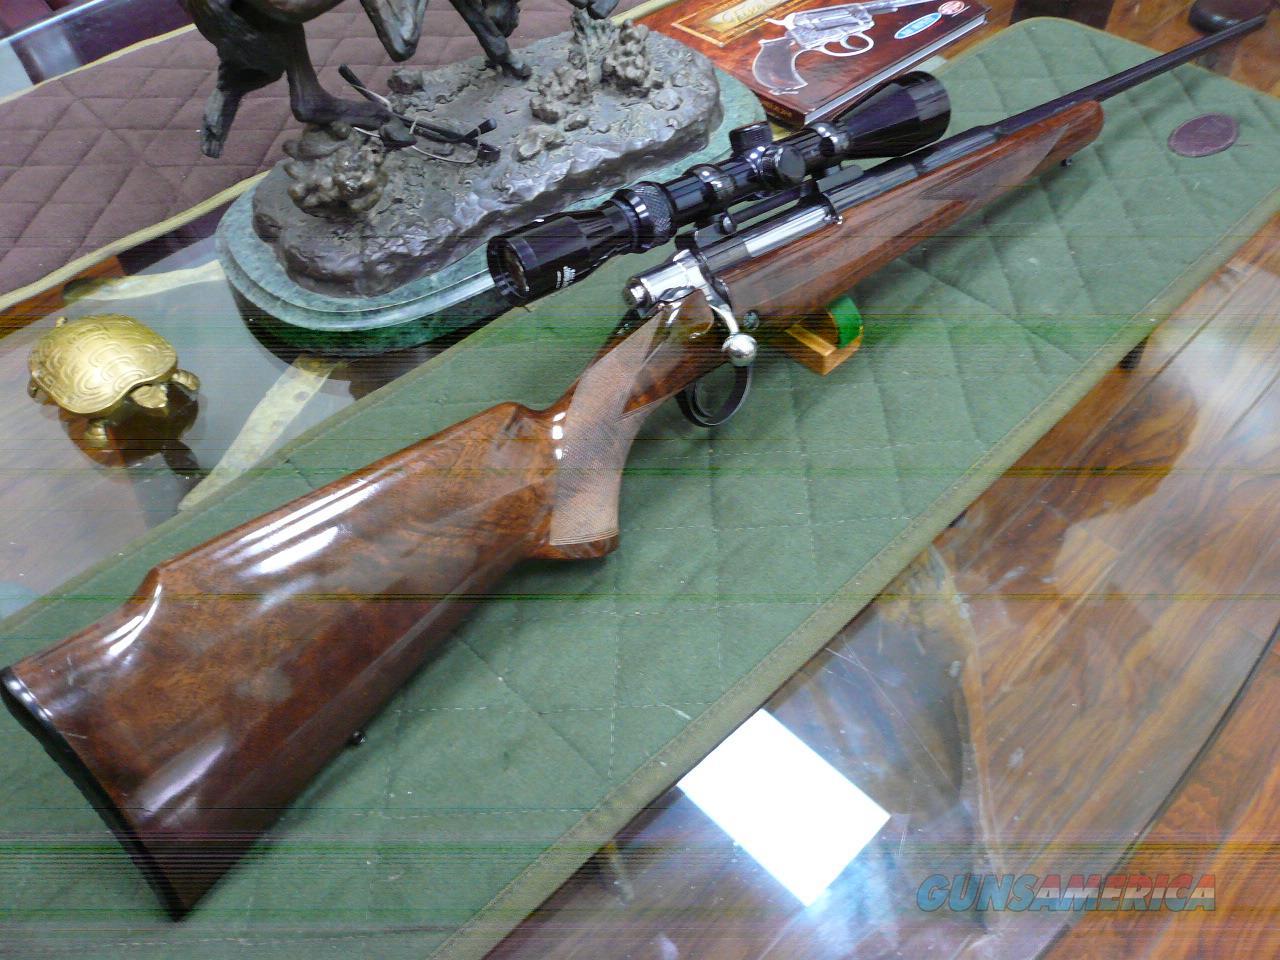 SAFARI GRADE MEDIUM SAKO ACTION (1971?),243 WIN  Guns > Rifles > Browning Rifles > Bolt Action > Hunting > Blue